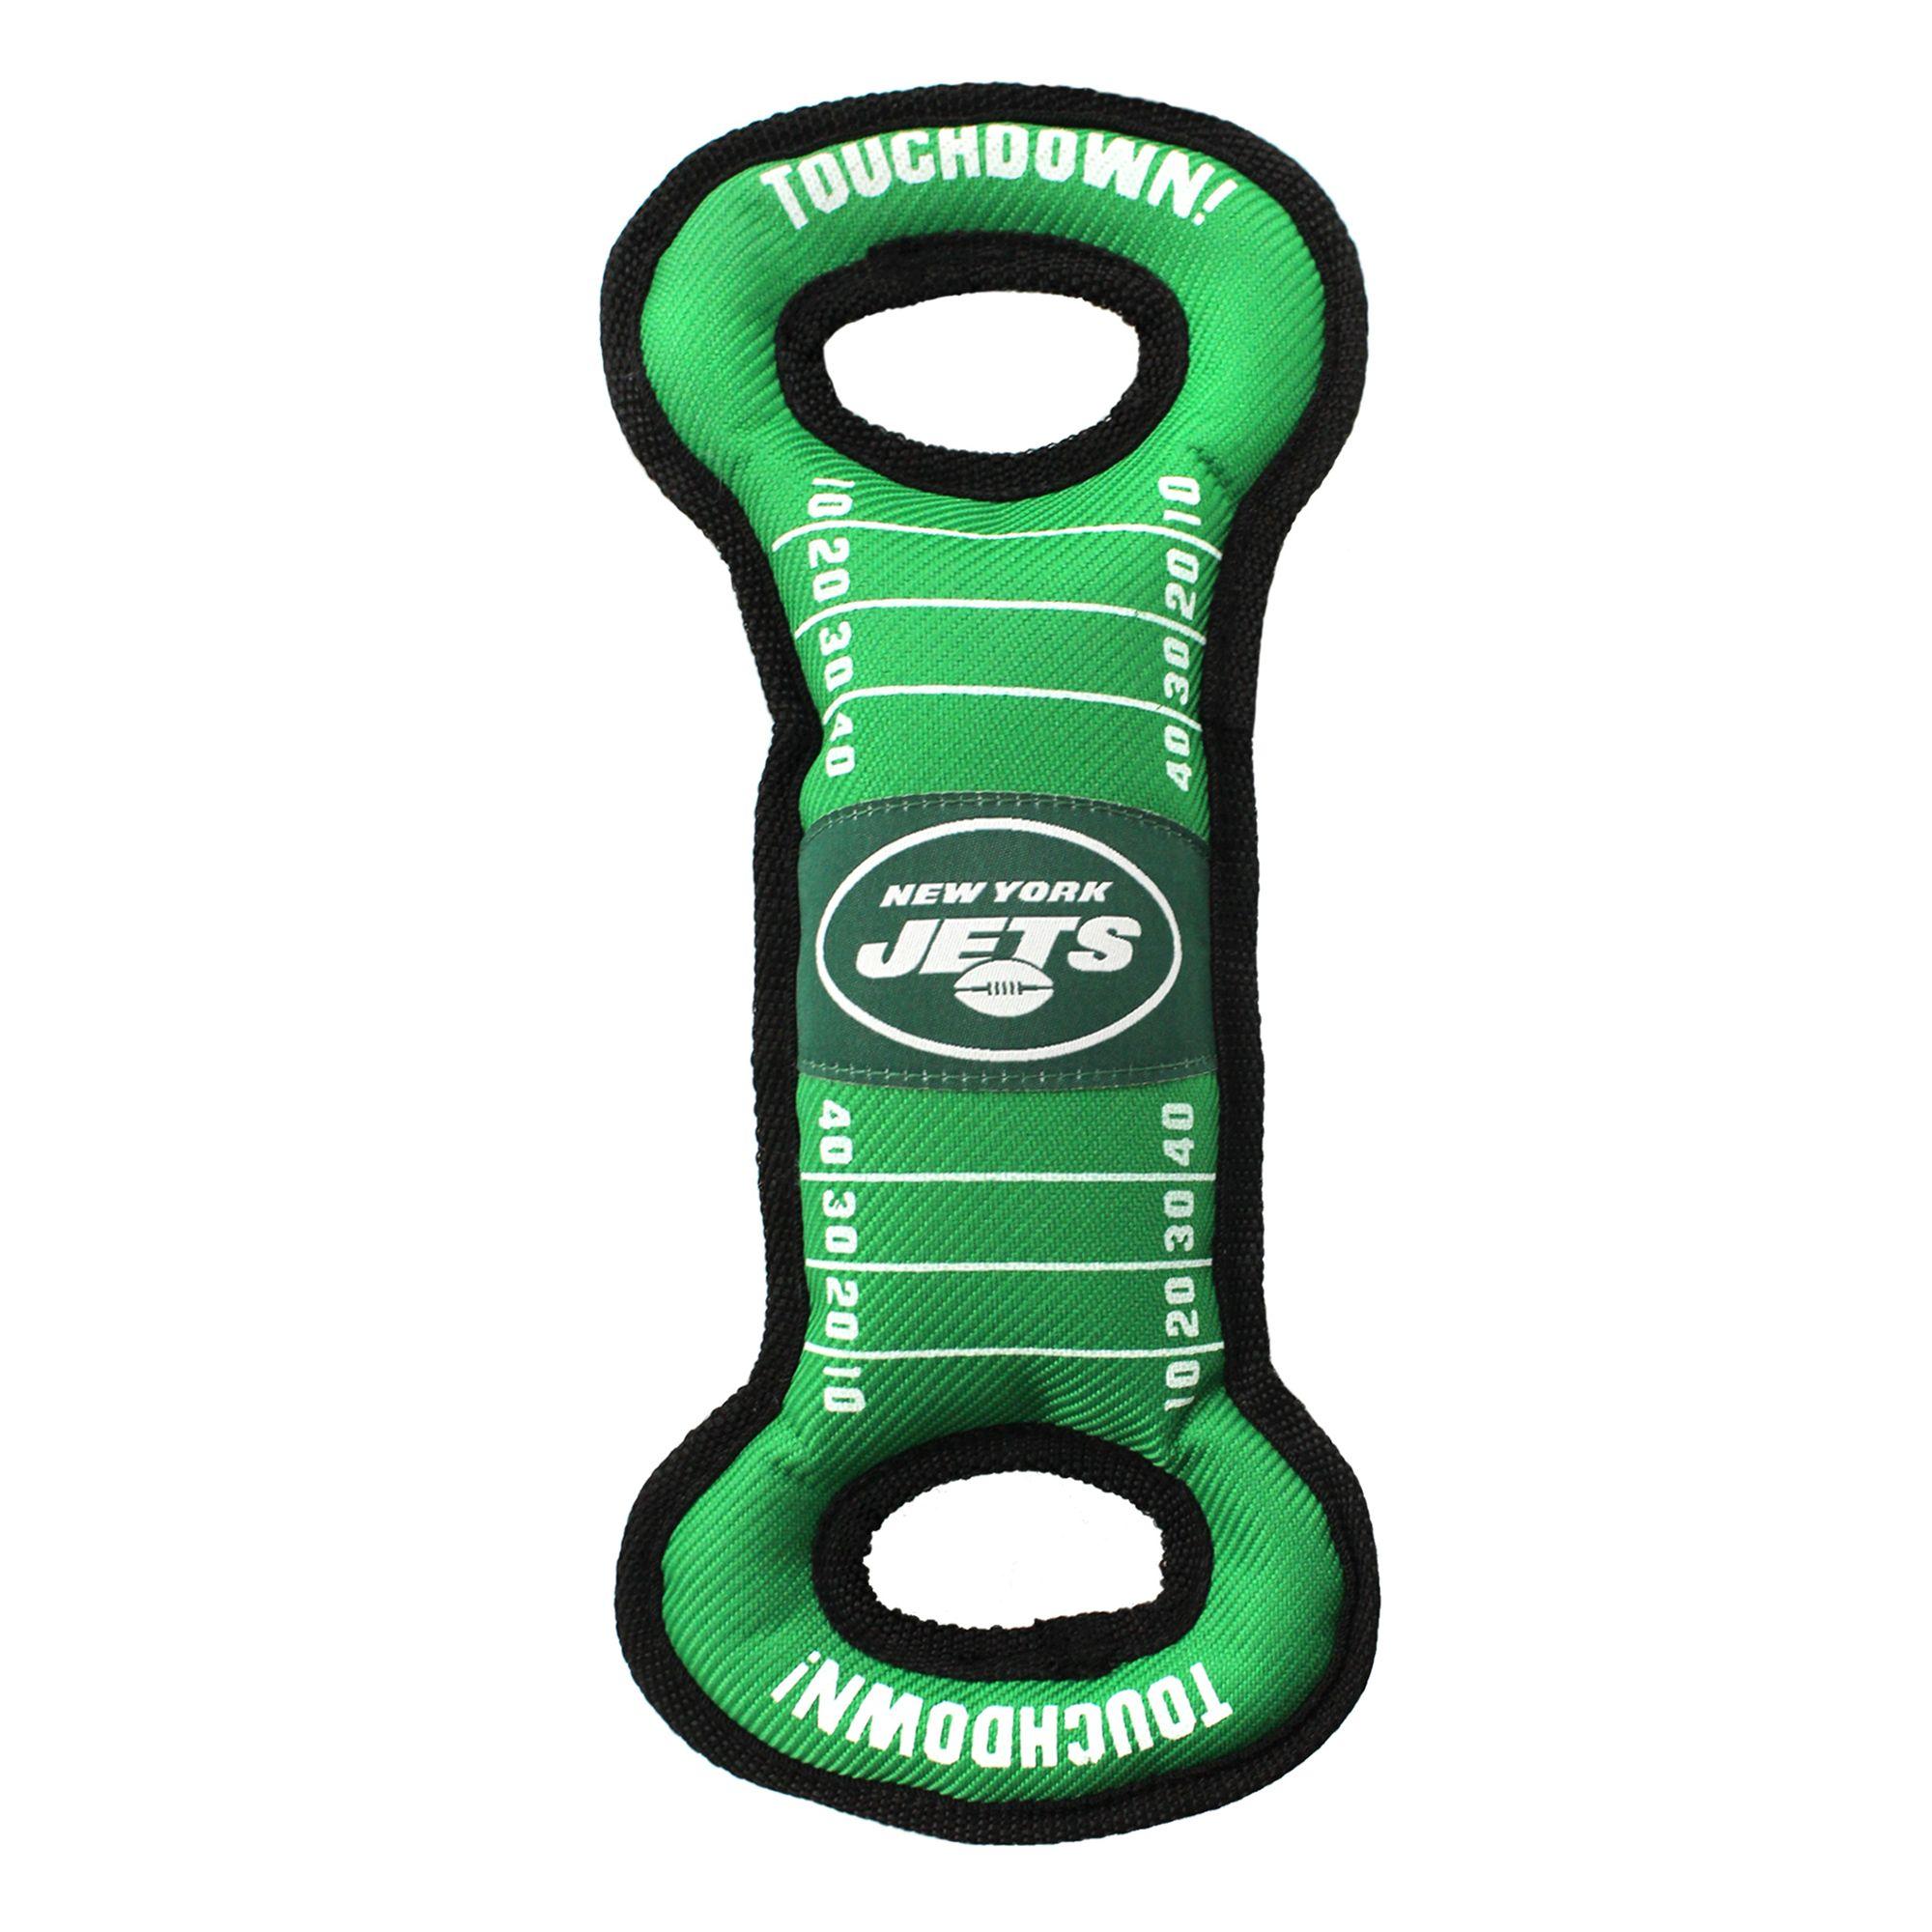 New York Jets NFL Field Dog Toy 5234289